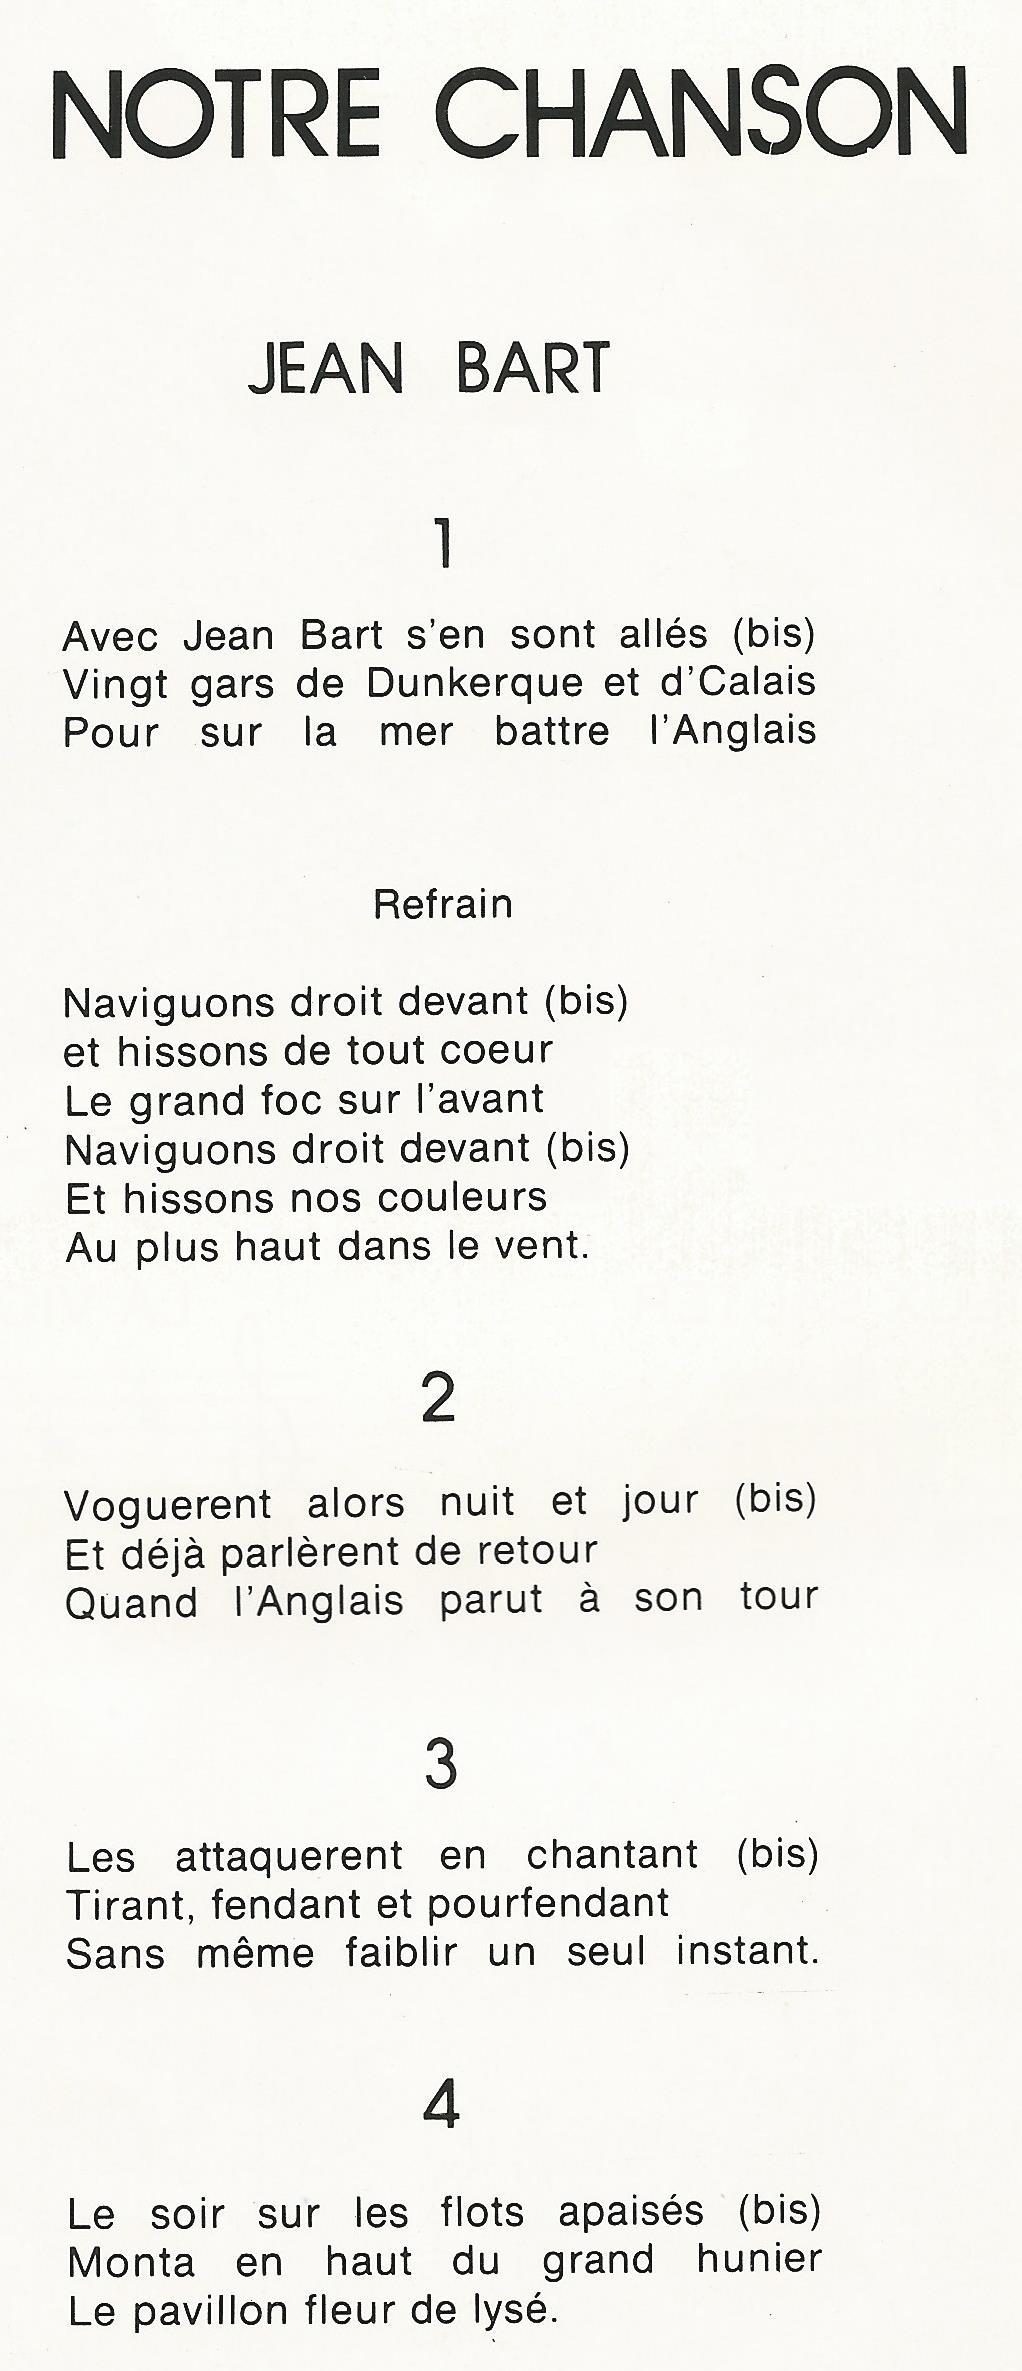 [ École des Mousses ] École des mousses 76/77 Mousse24